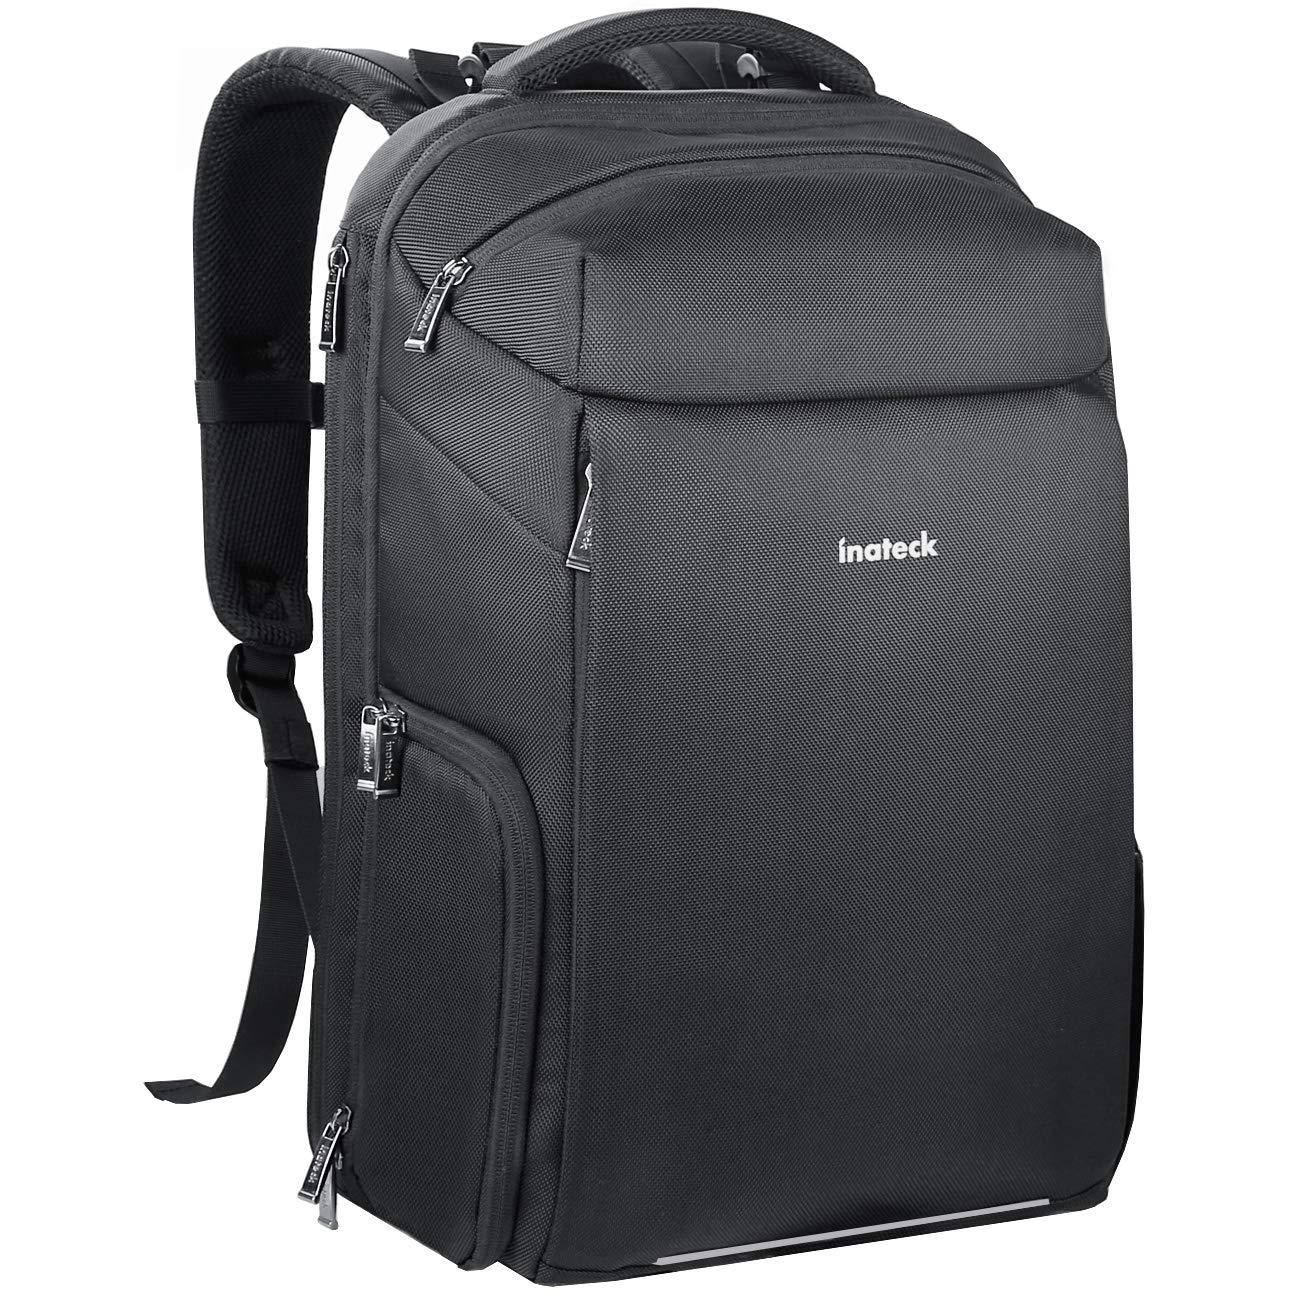 Inateck 3 in 1 DSLRカメラ/ 15.6インチノートパソコン/トラベルバックパック、多機能防水キャンバスバックパック、スーツケースデザイン、レインカバーと三脚、黒